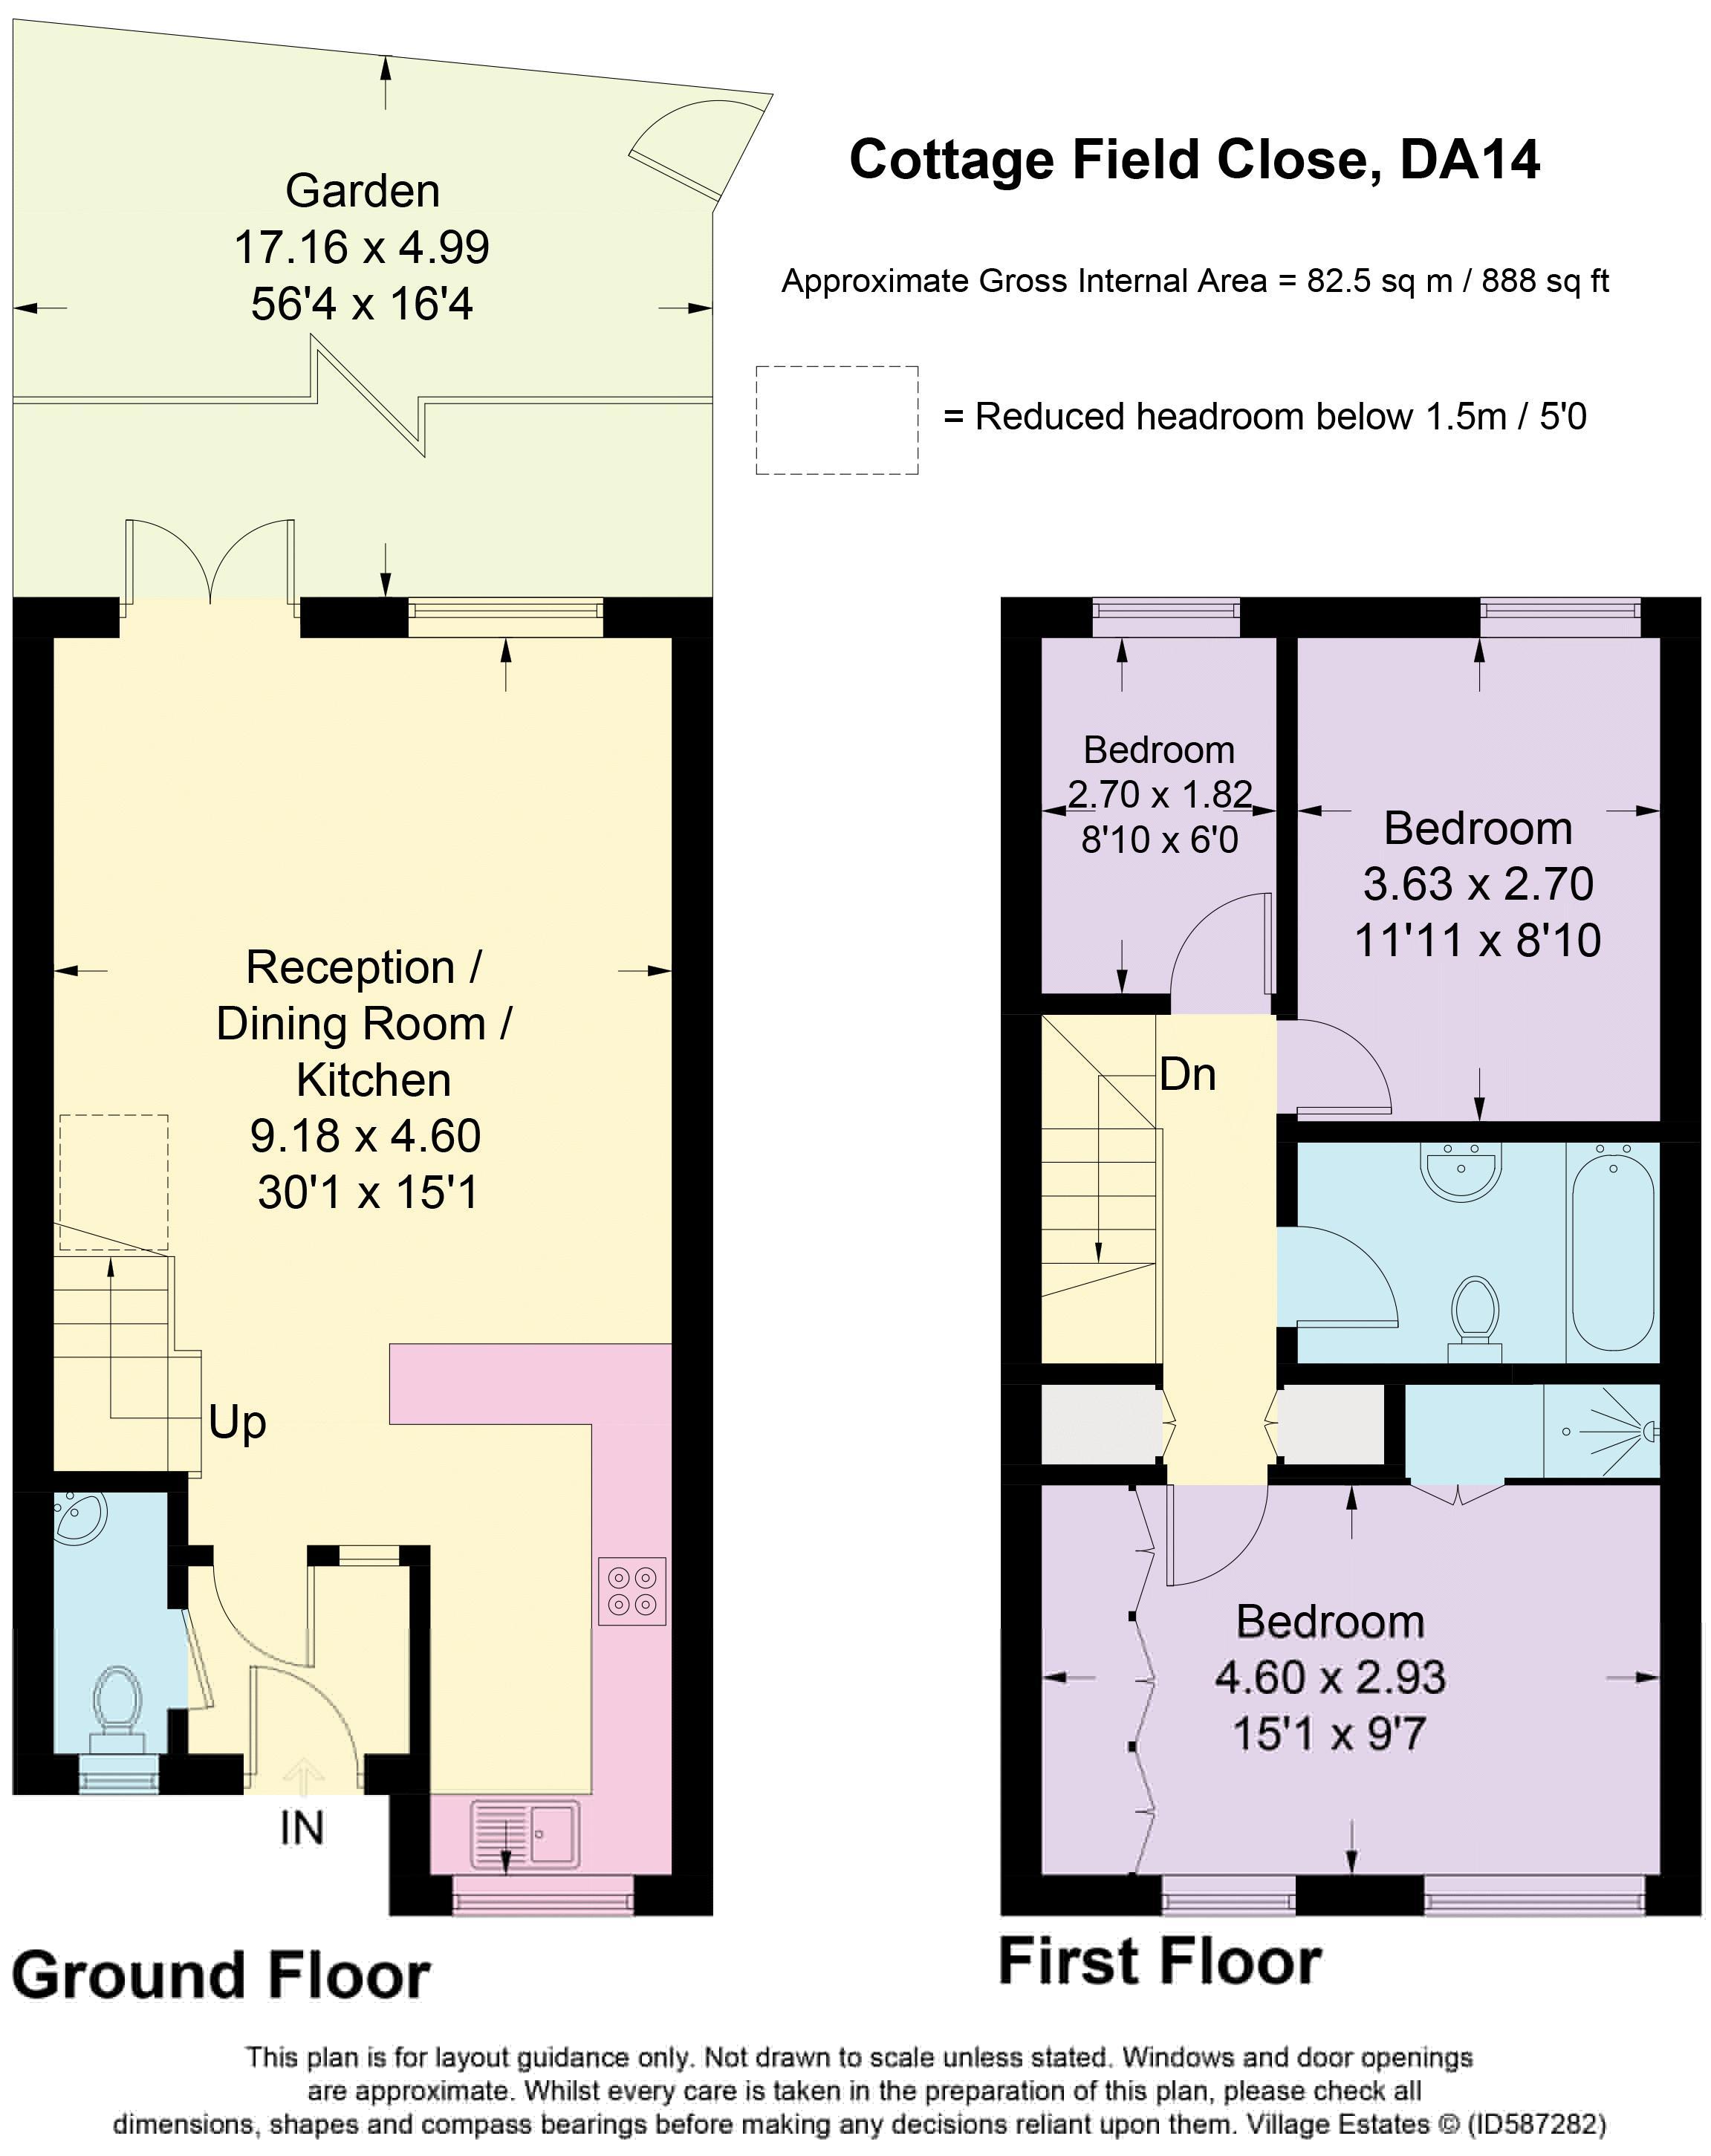 Cottage Field Close Floorplan